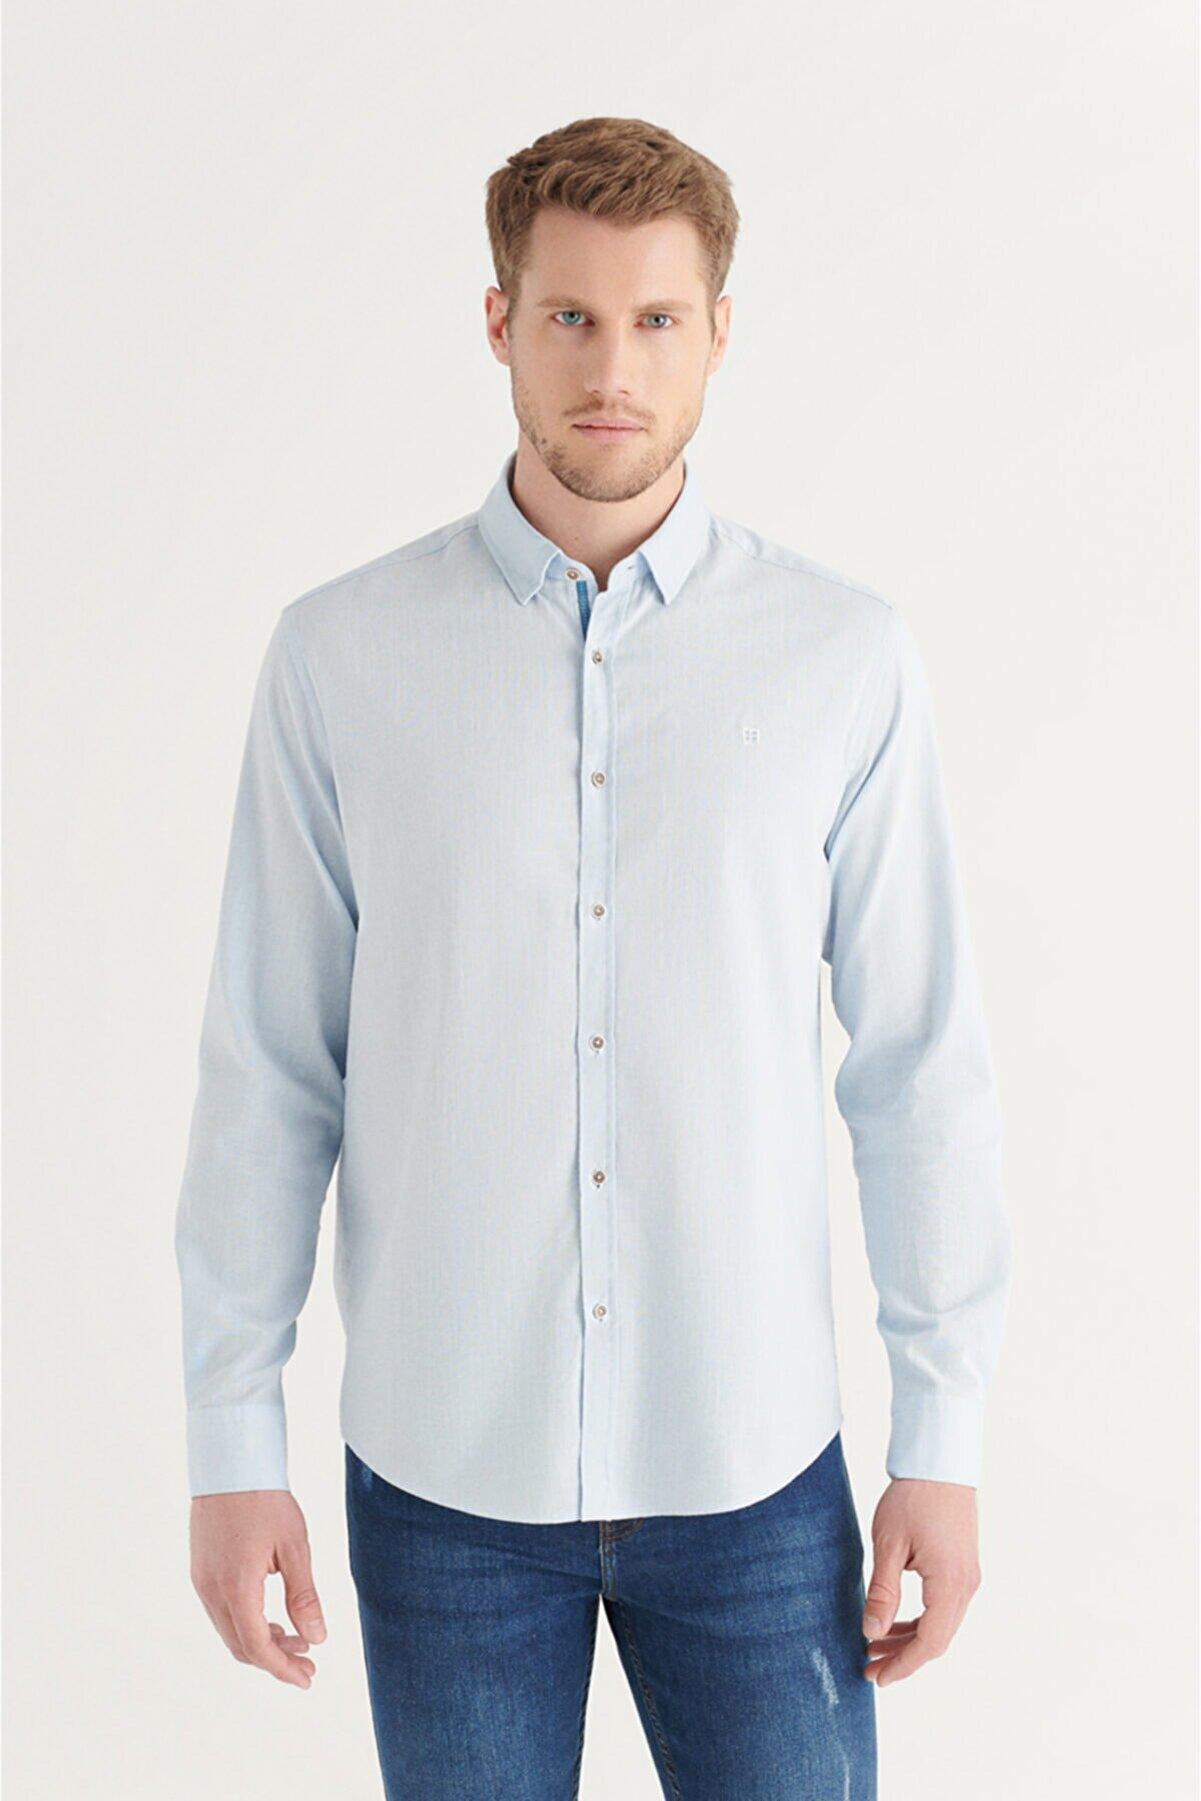 Avva Erkek Açık Mavi Düz Alttan Britli Yaka Regular Fit Gömlek A11y2141